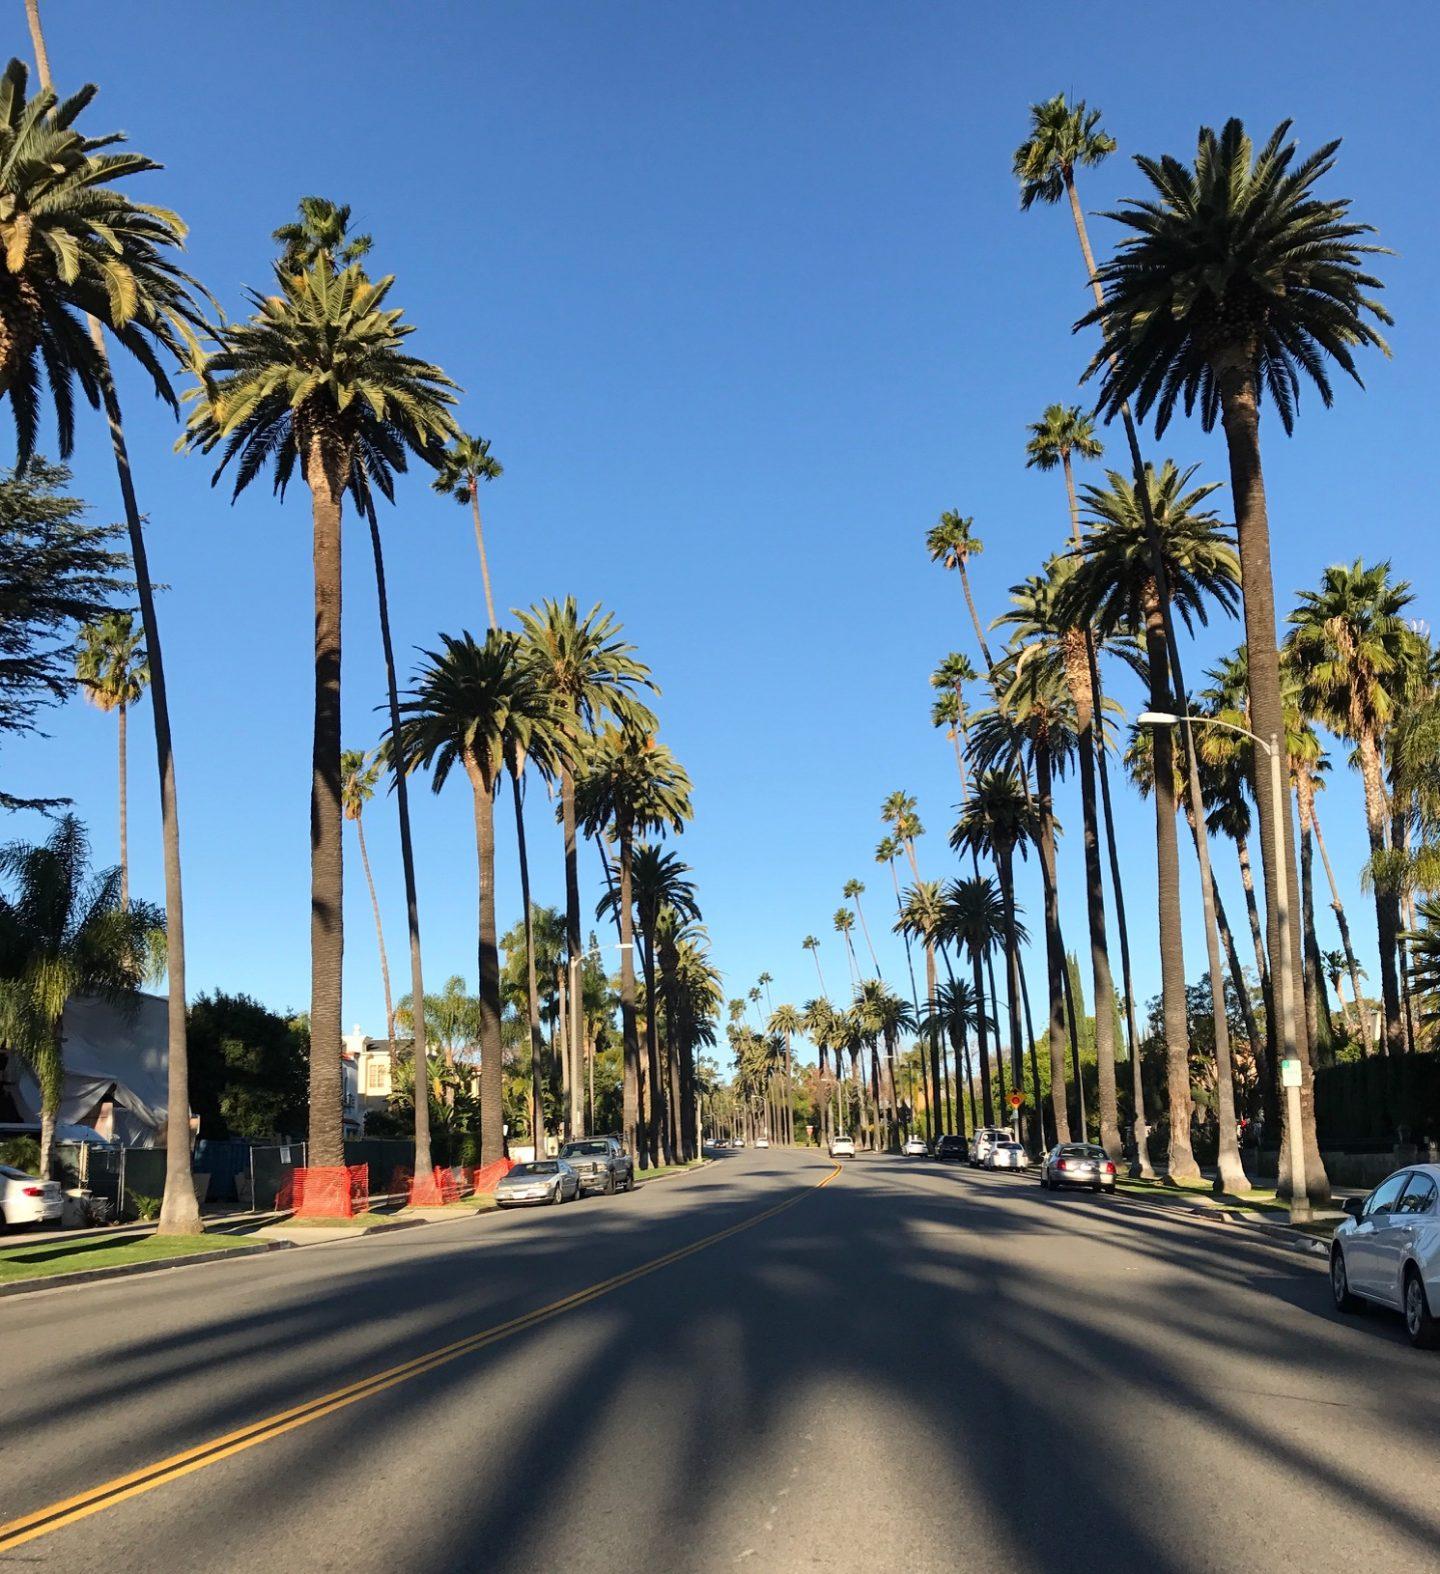 LA Diaries: My Holiday Part II